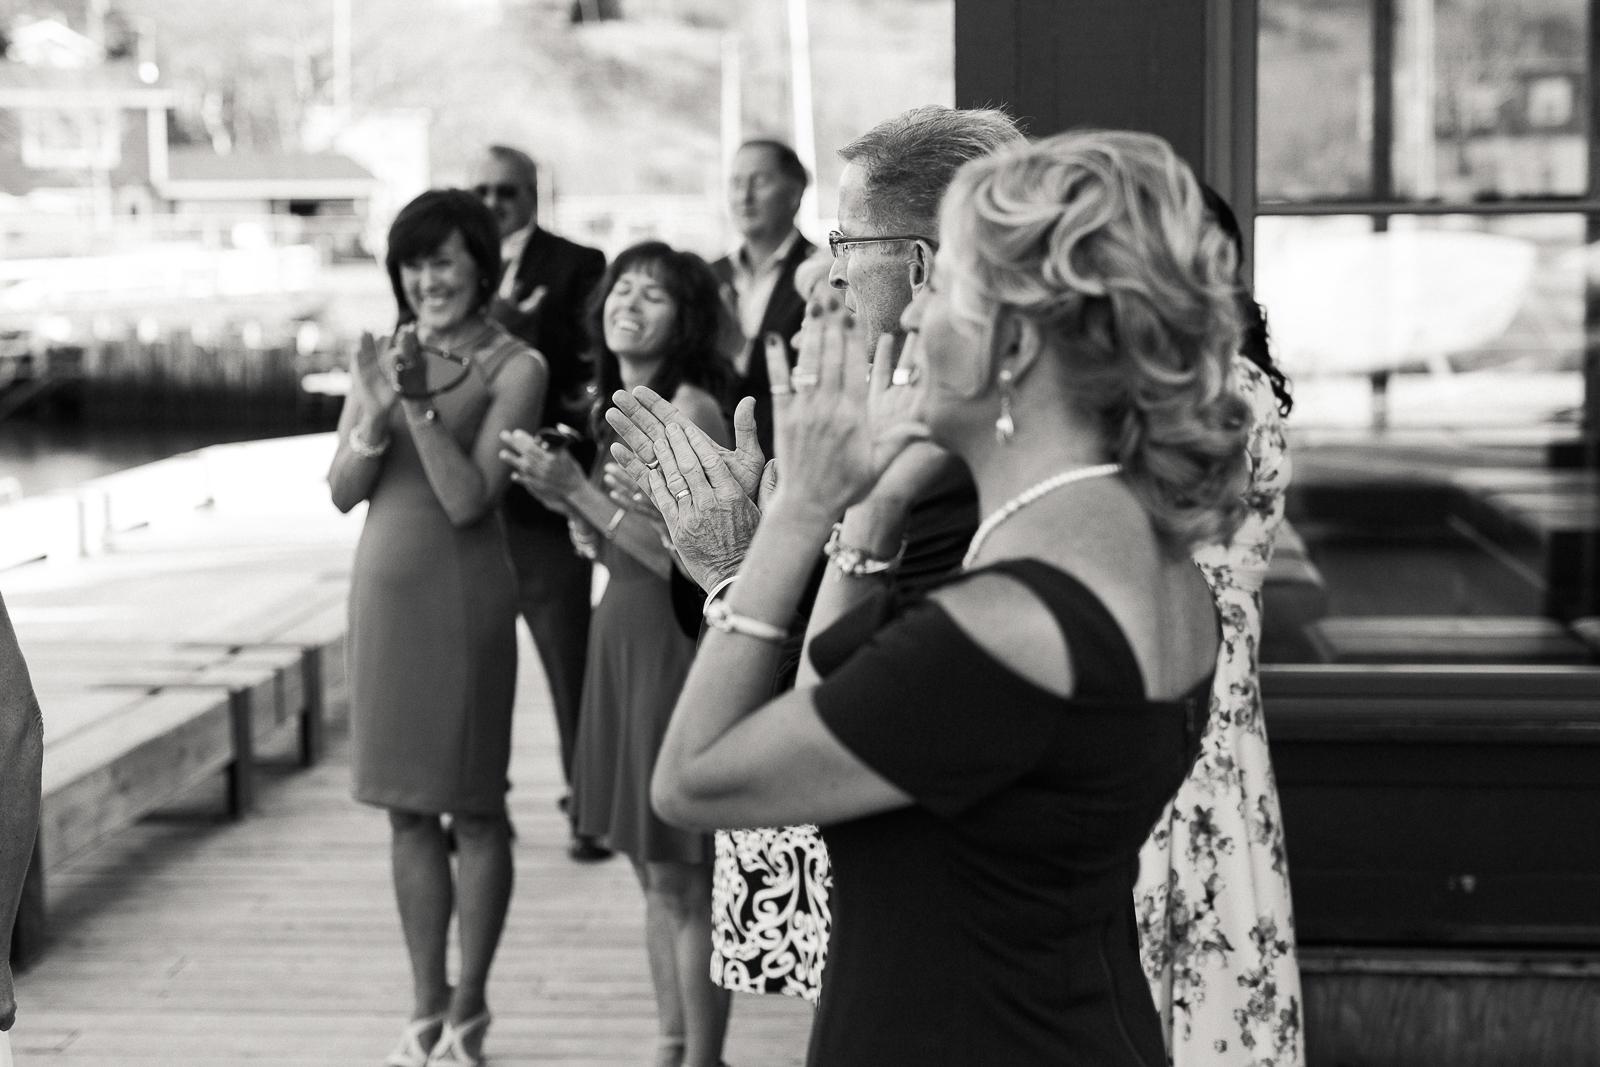 quidi-vidi-wedding-photographer-michelle-don-25.jpg